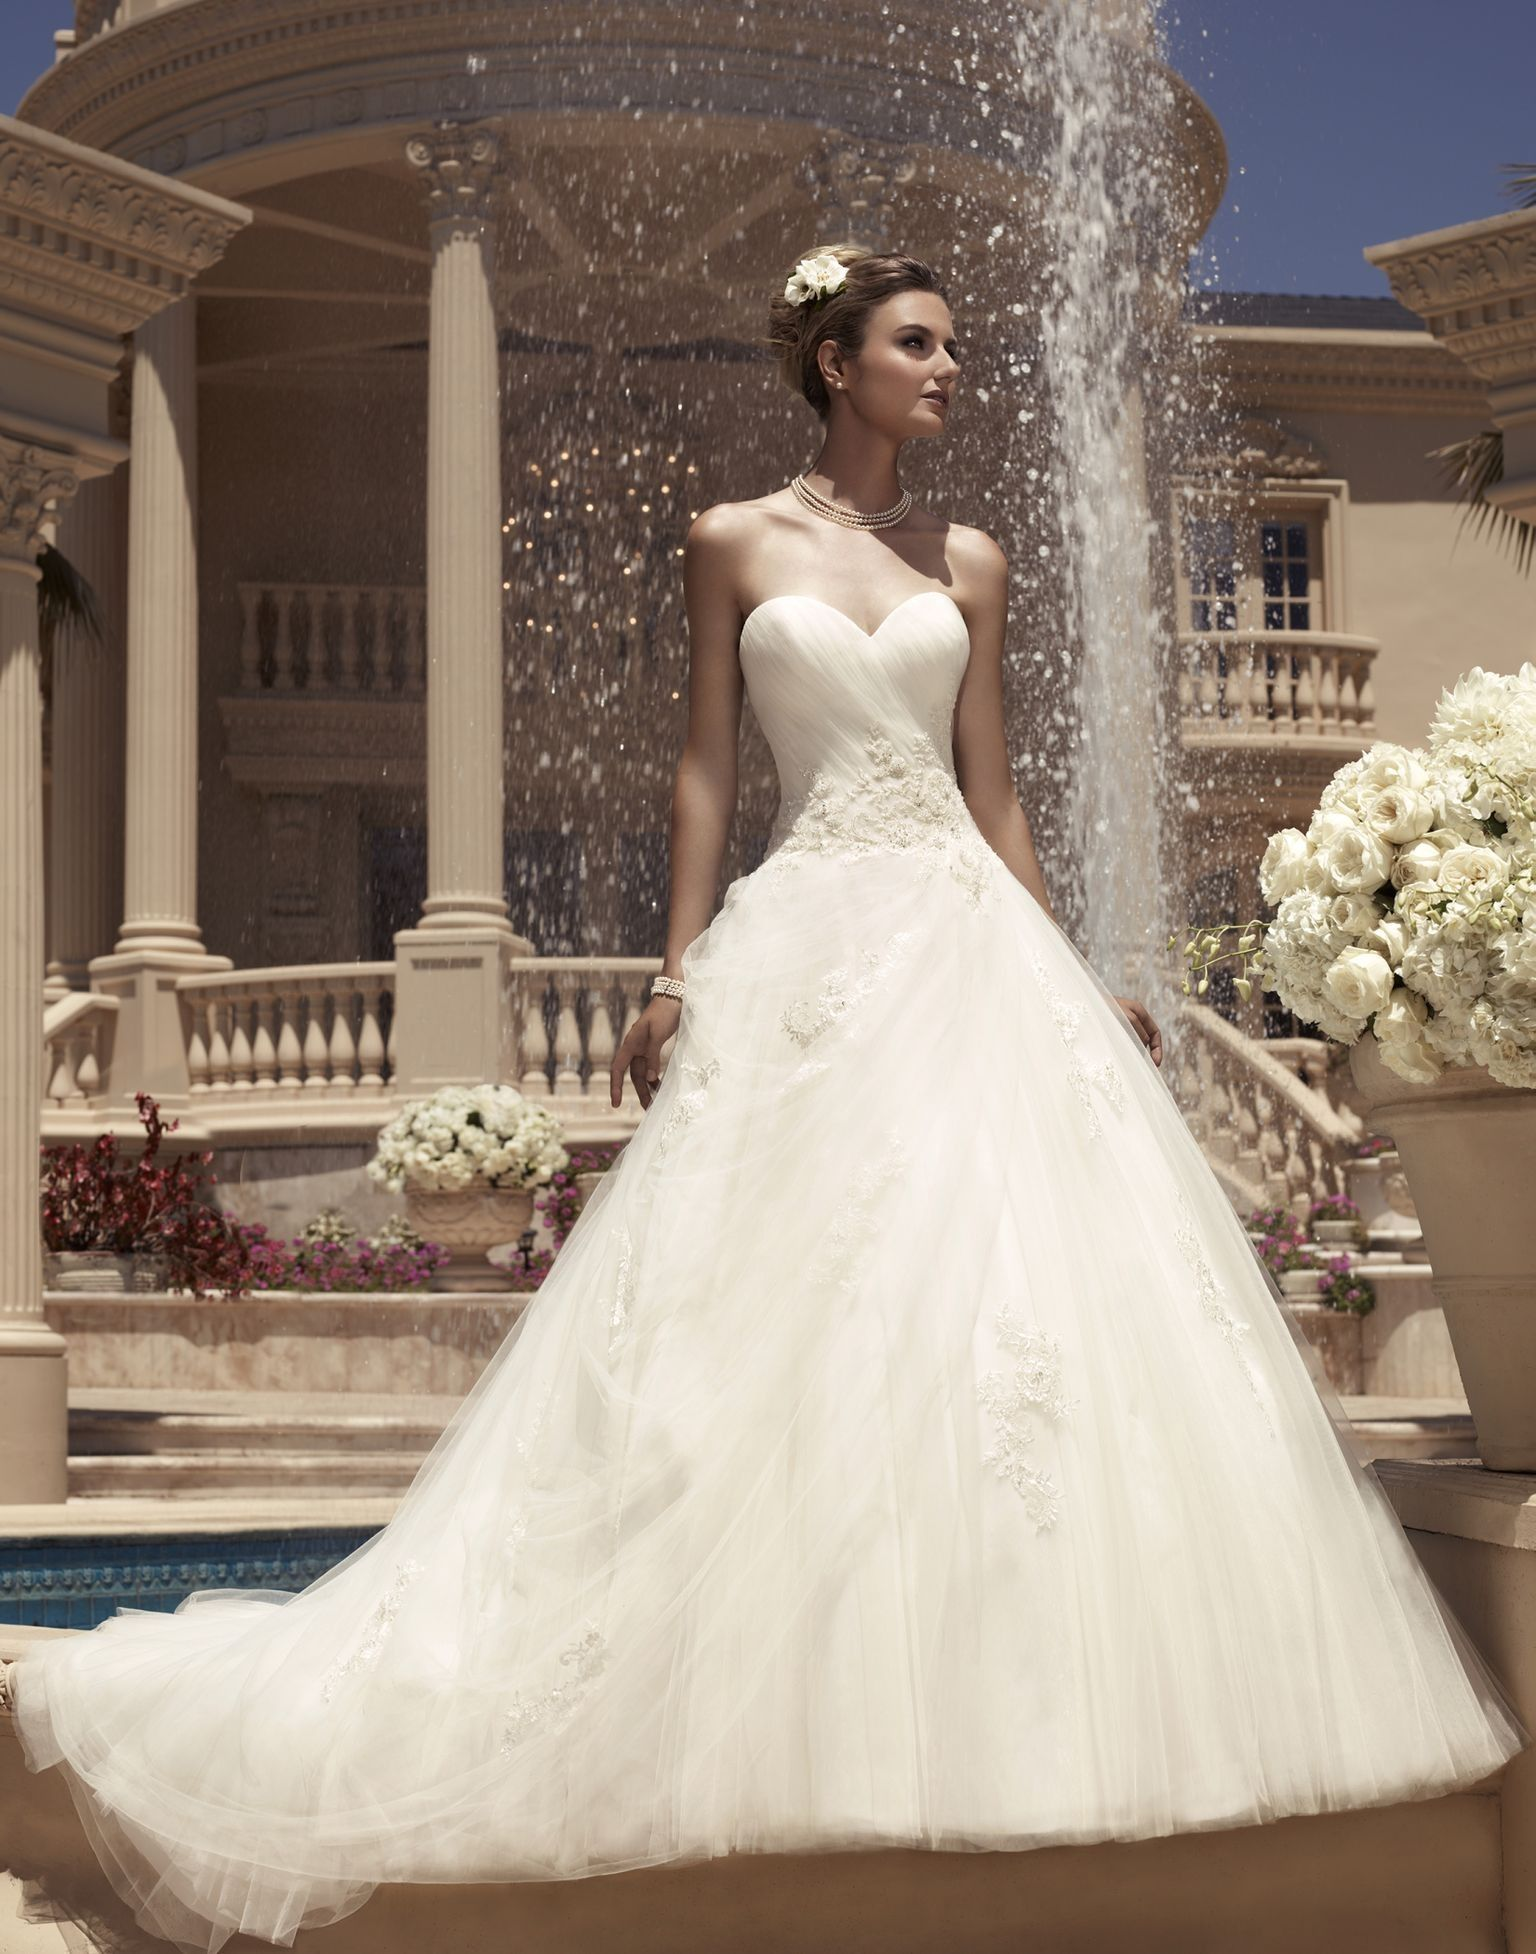 Casablanca Bridal Style 2112 Sweetheart wedding dress